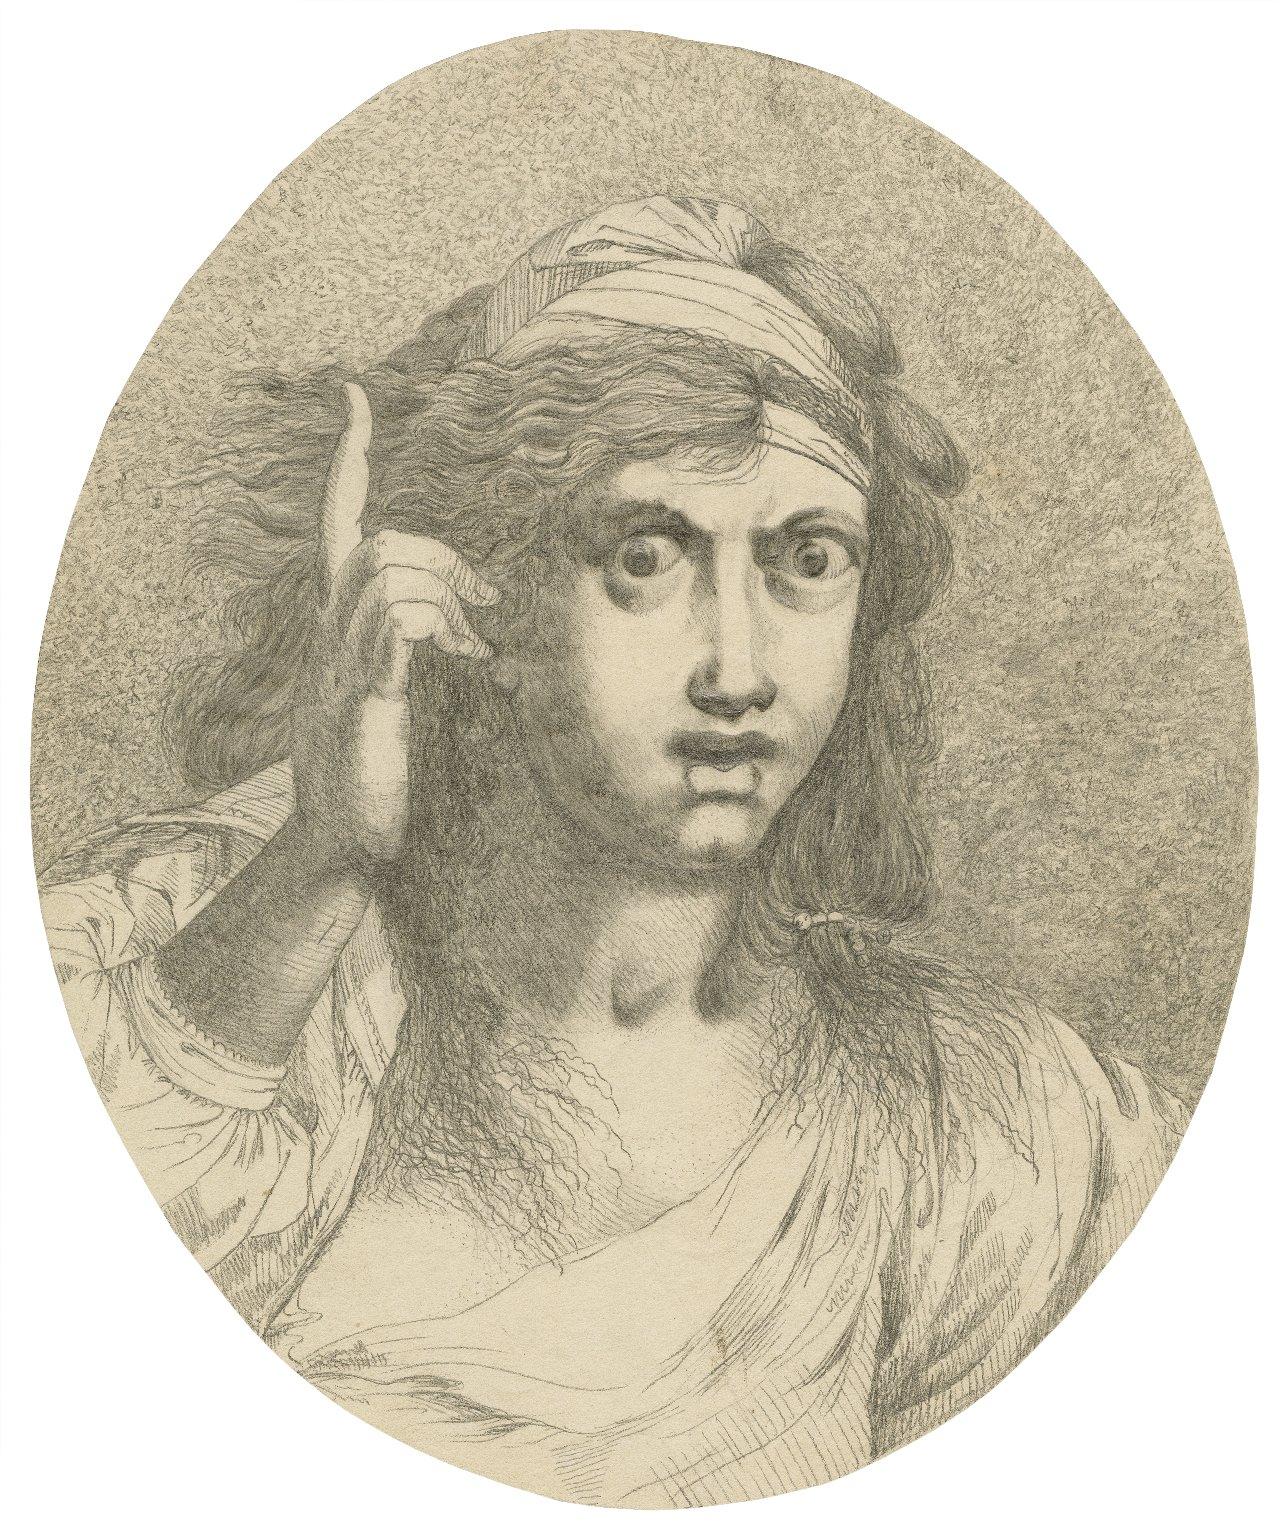 [Troilus and Cressida, portrait of Cassandra] [graphic] / [John Hamilton Mortimer].